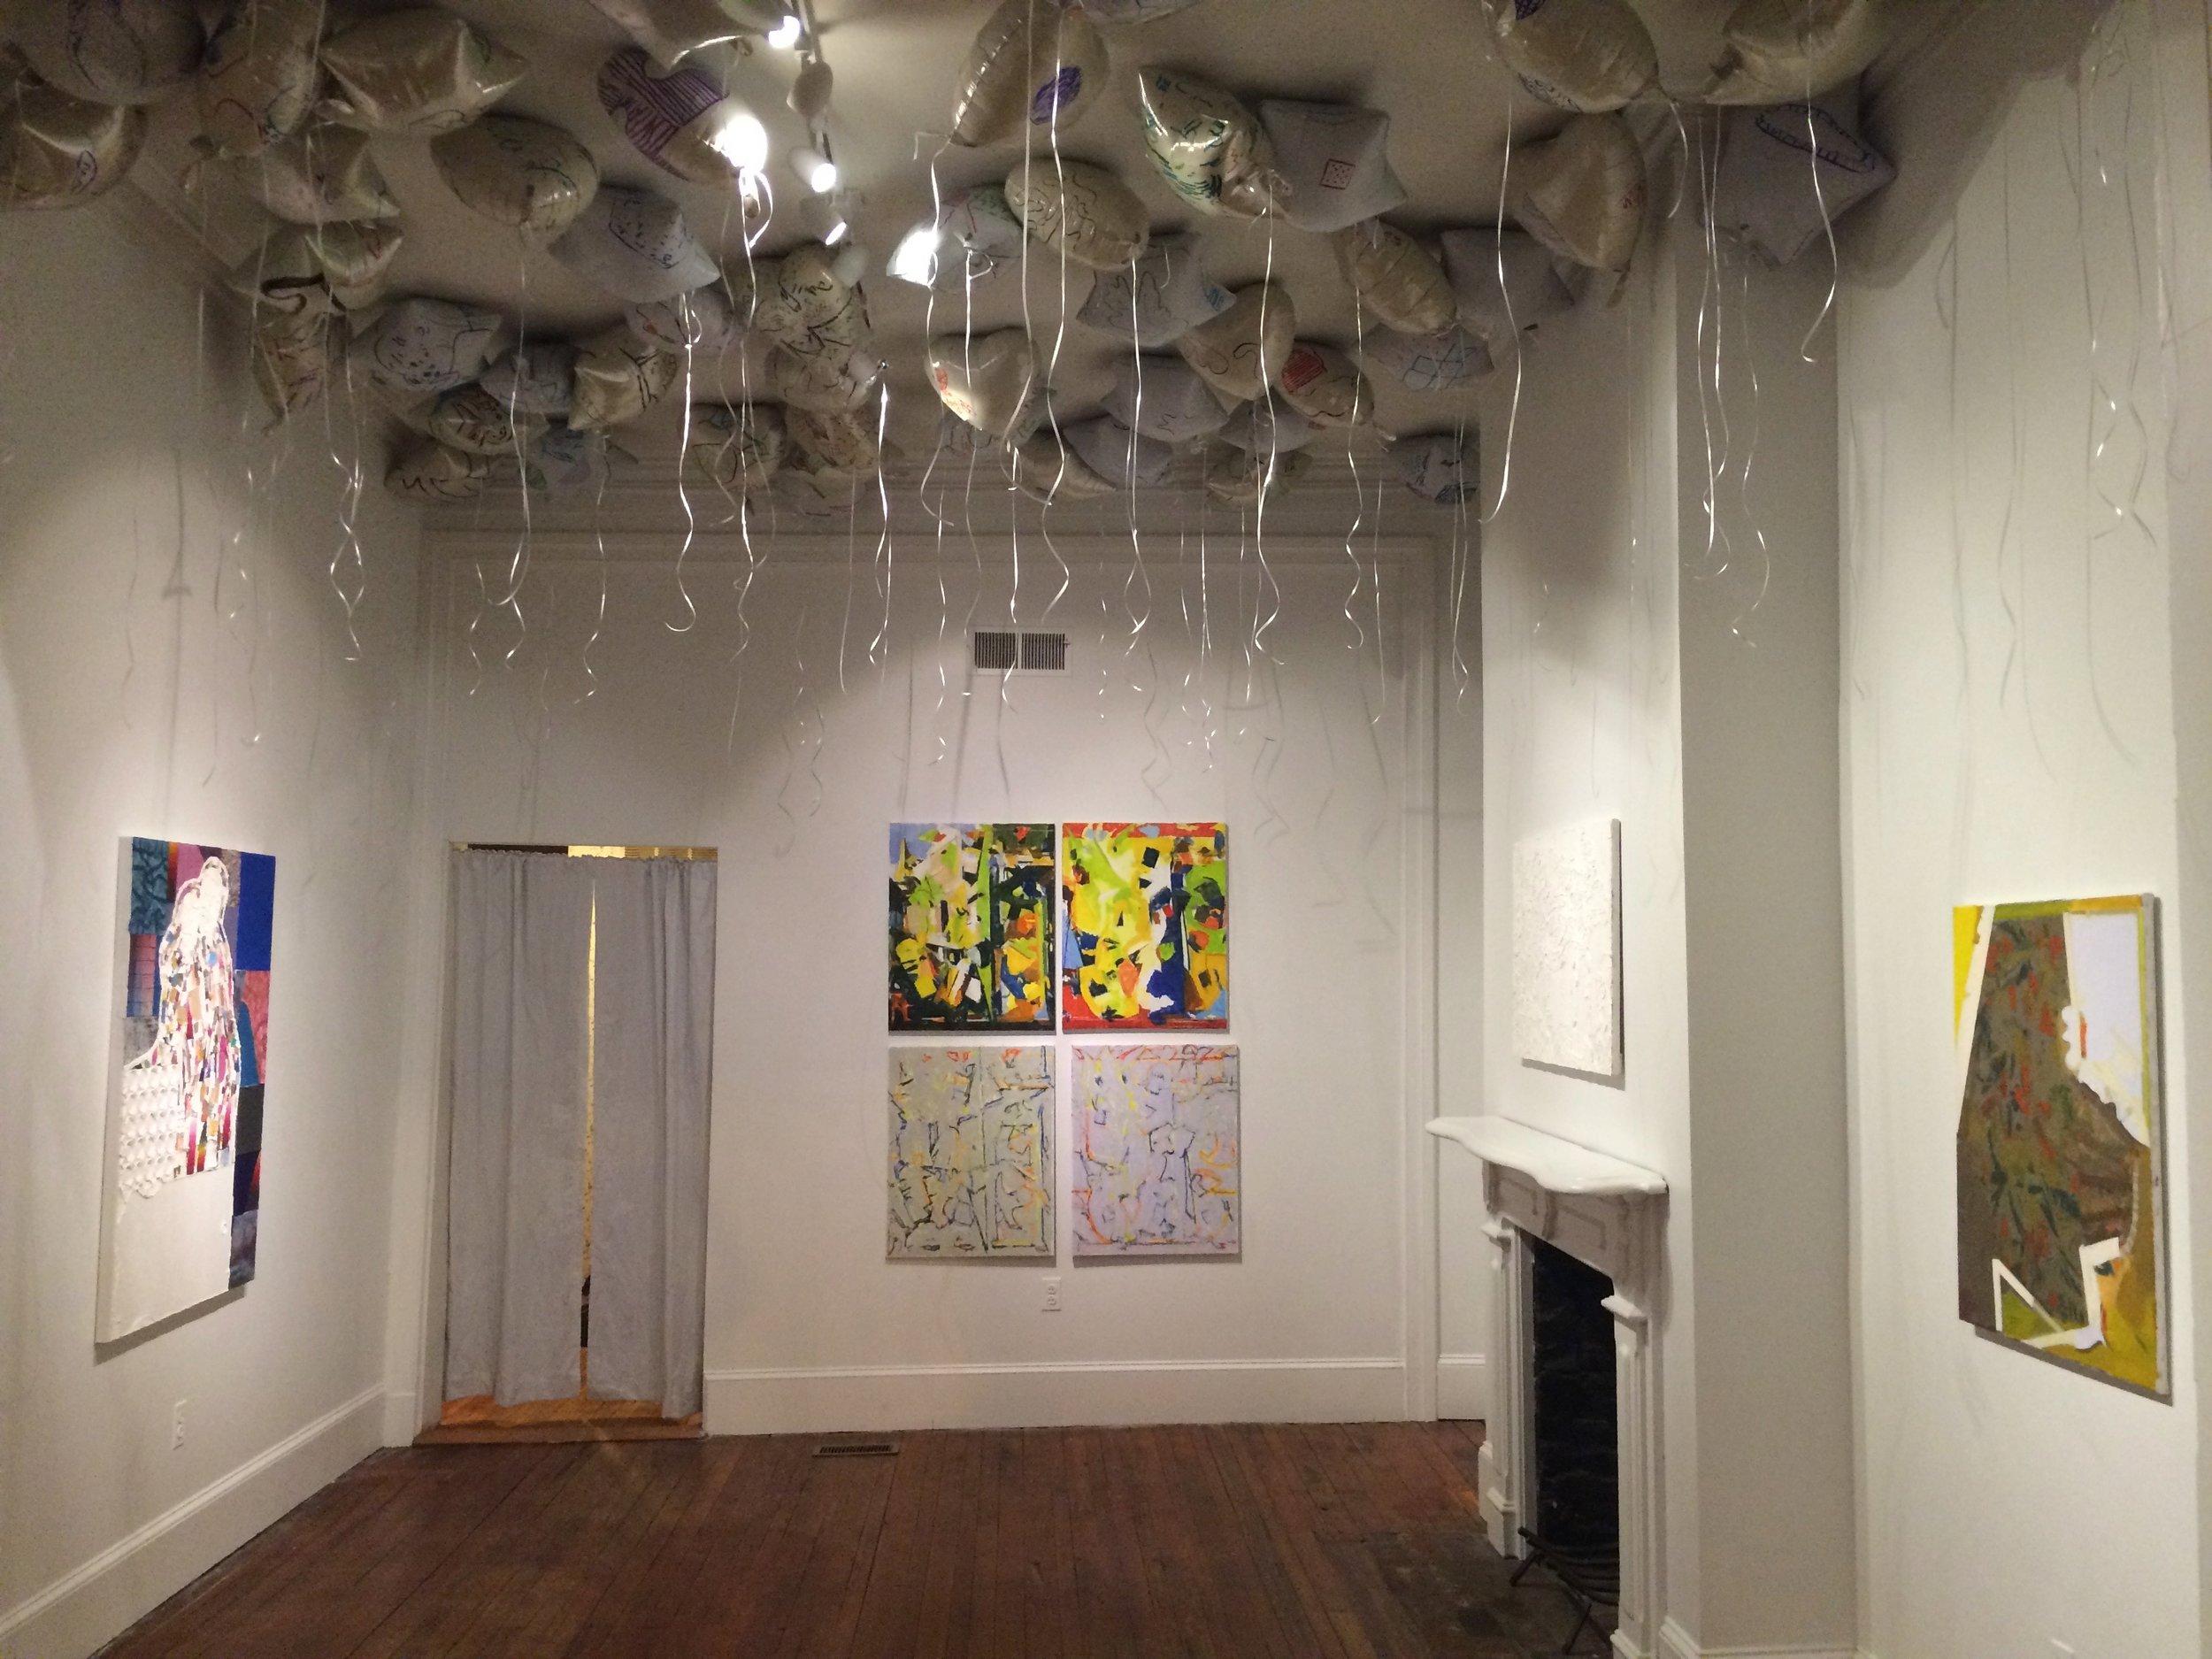 SNAFU! Sangram Majumdar and Dominic Terlizzi  Oct 17 - Nov 20, 2014 Platform Gallery, Baltimore, MD